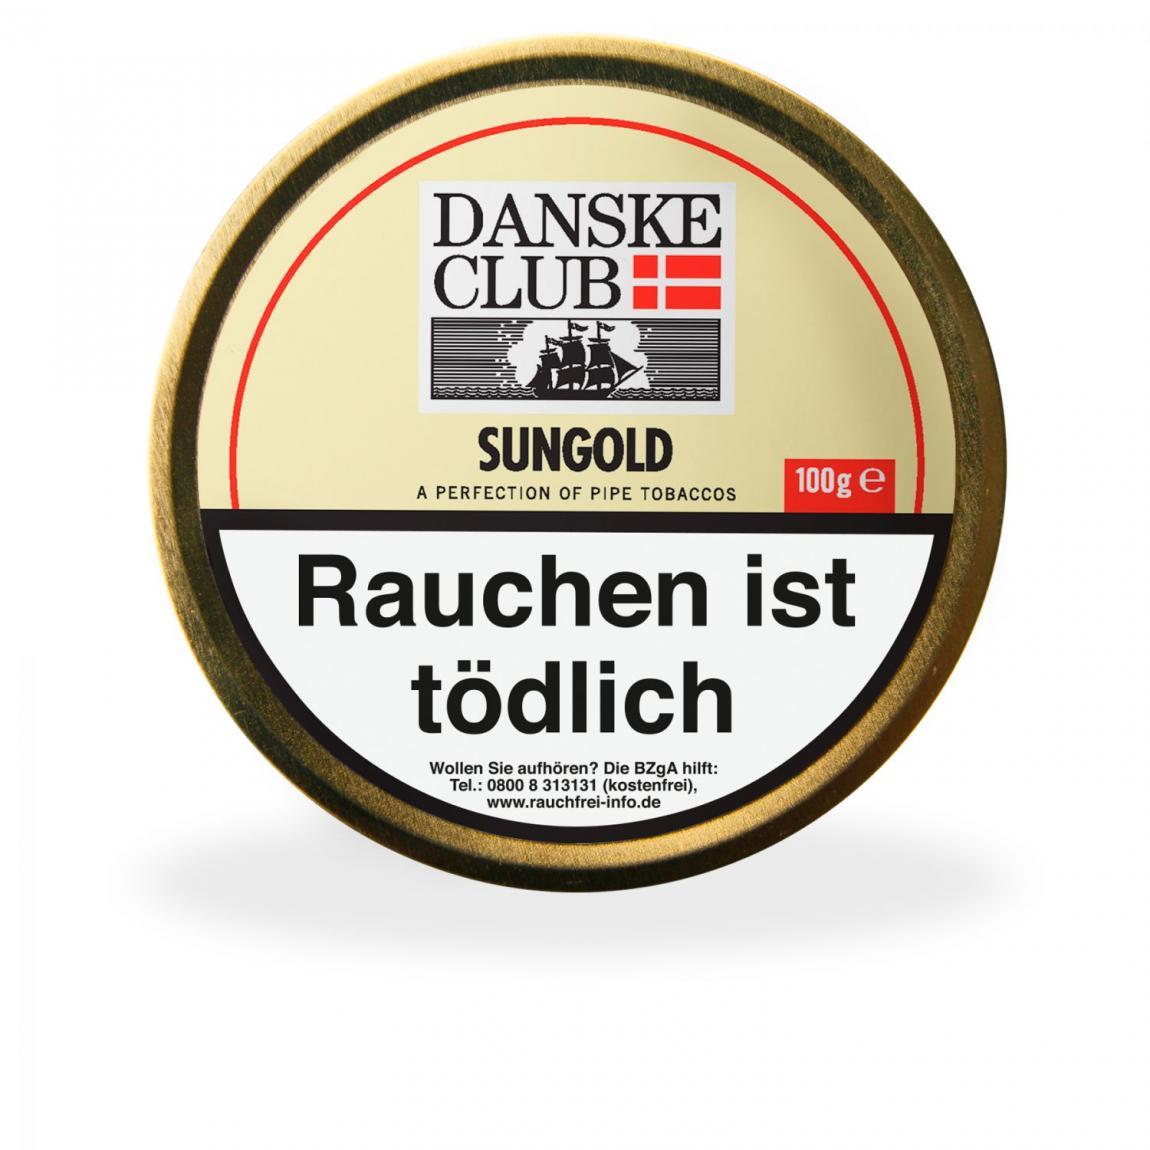 Danske Club »Sungold« 100g Dose